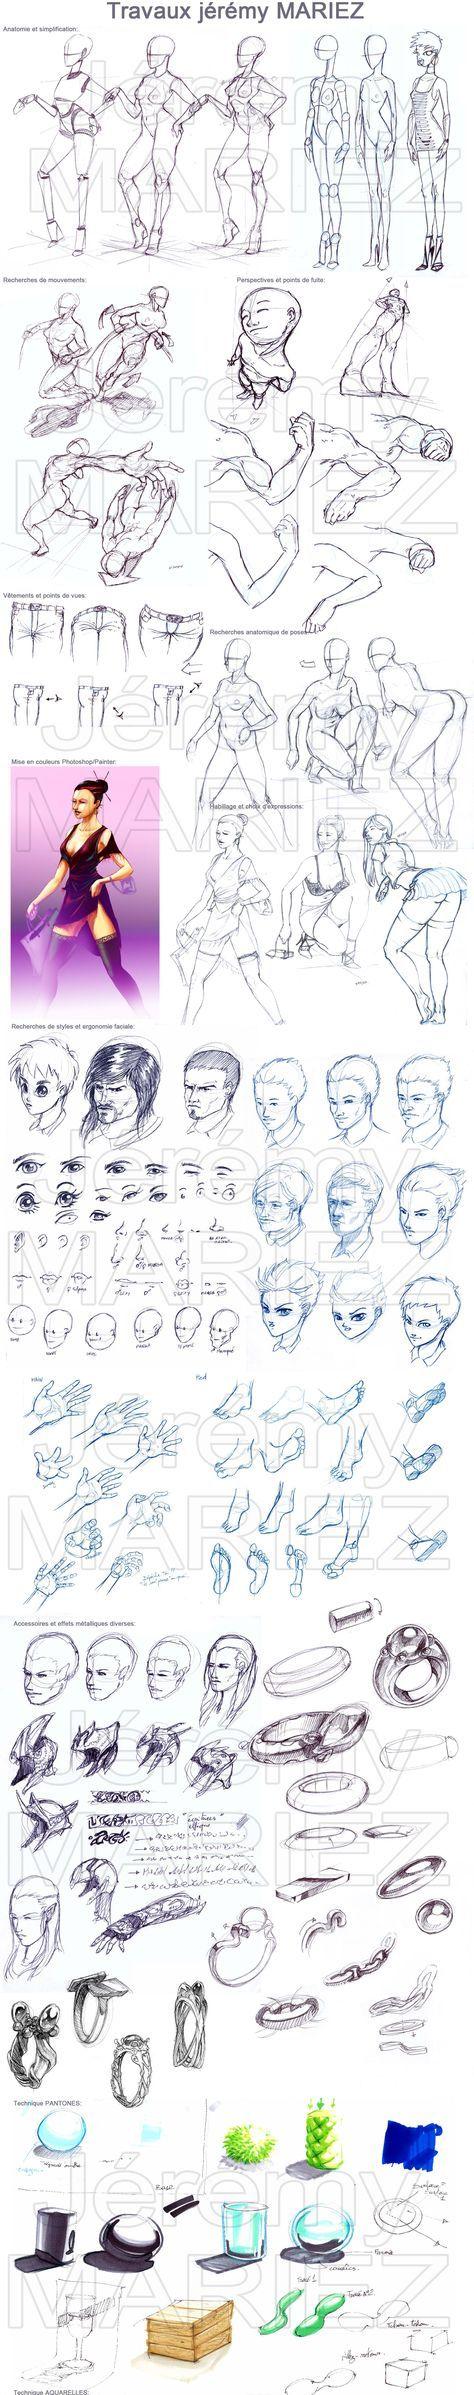 tutorial character design 01 by *choptider on deviantART